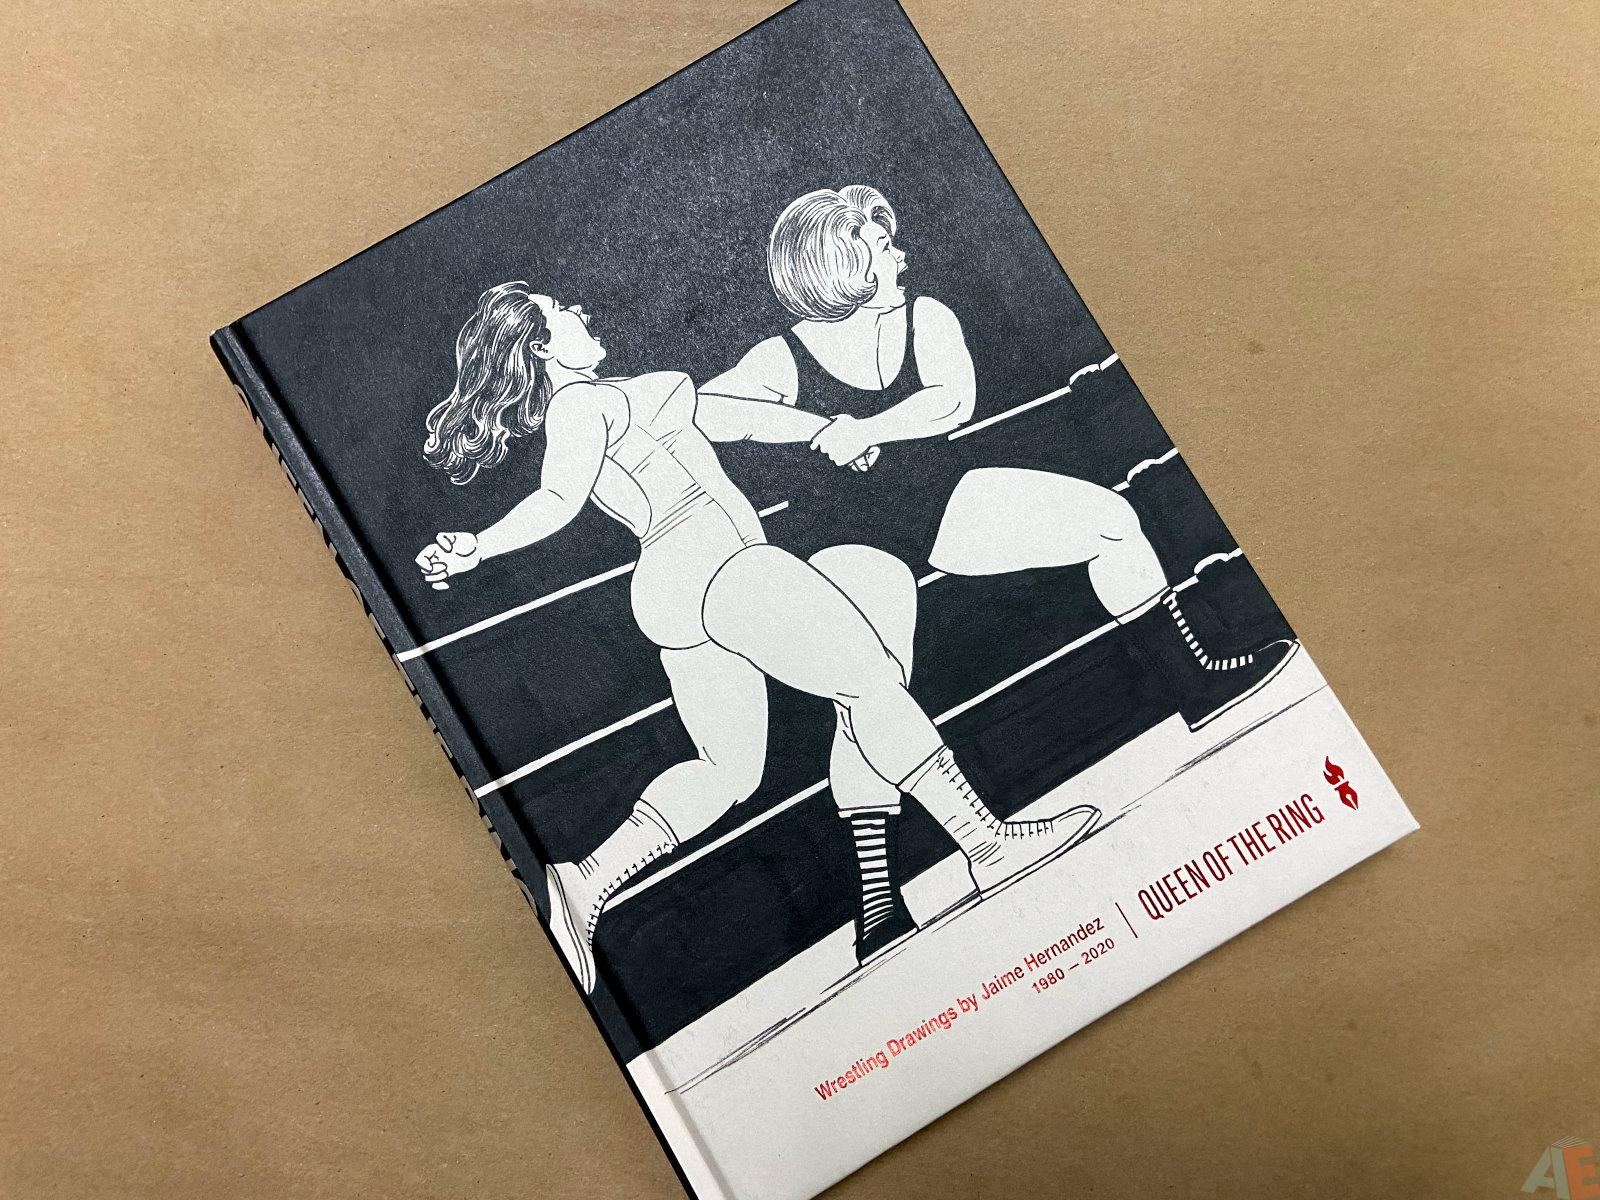 Queen of the Ring Wrestling Drawings by Jaime Hernandez 1980 2020 interior 14